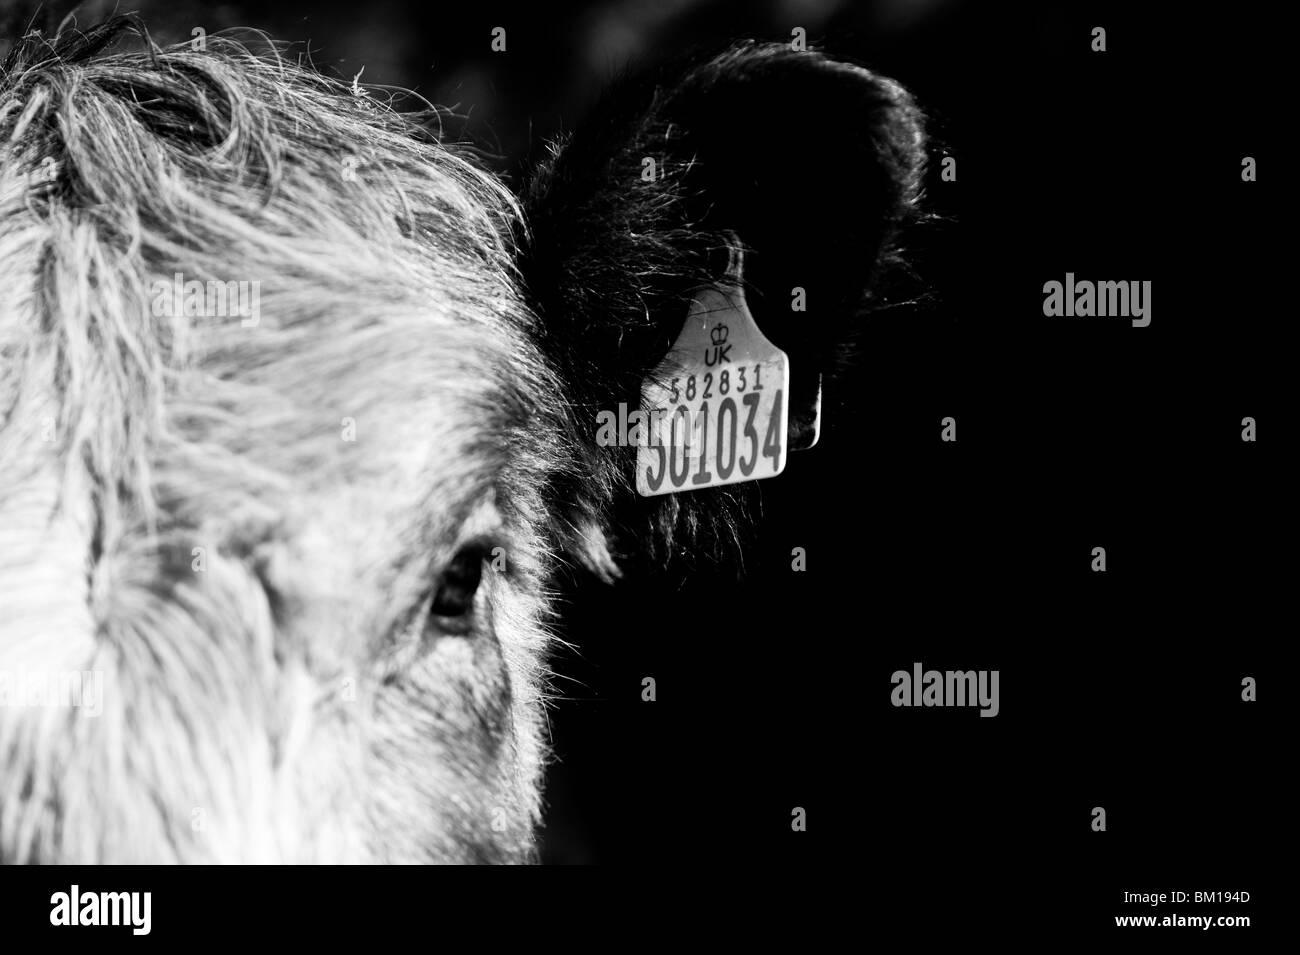 Campagne agricole Robert Galloway vache veau mâle Photo Stock